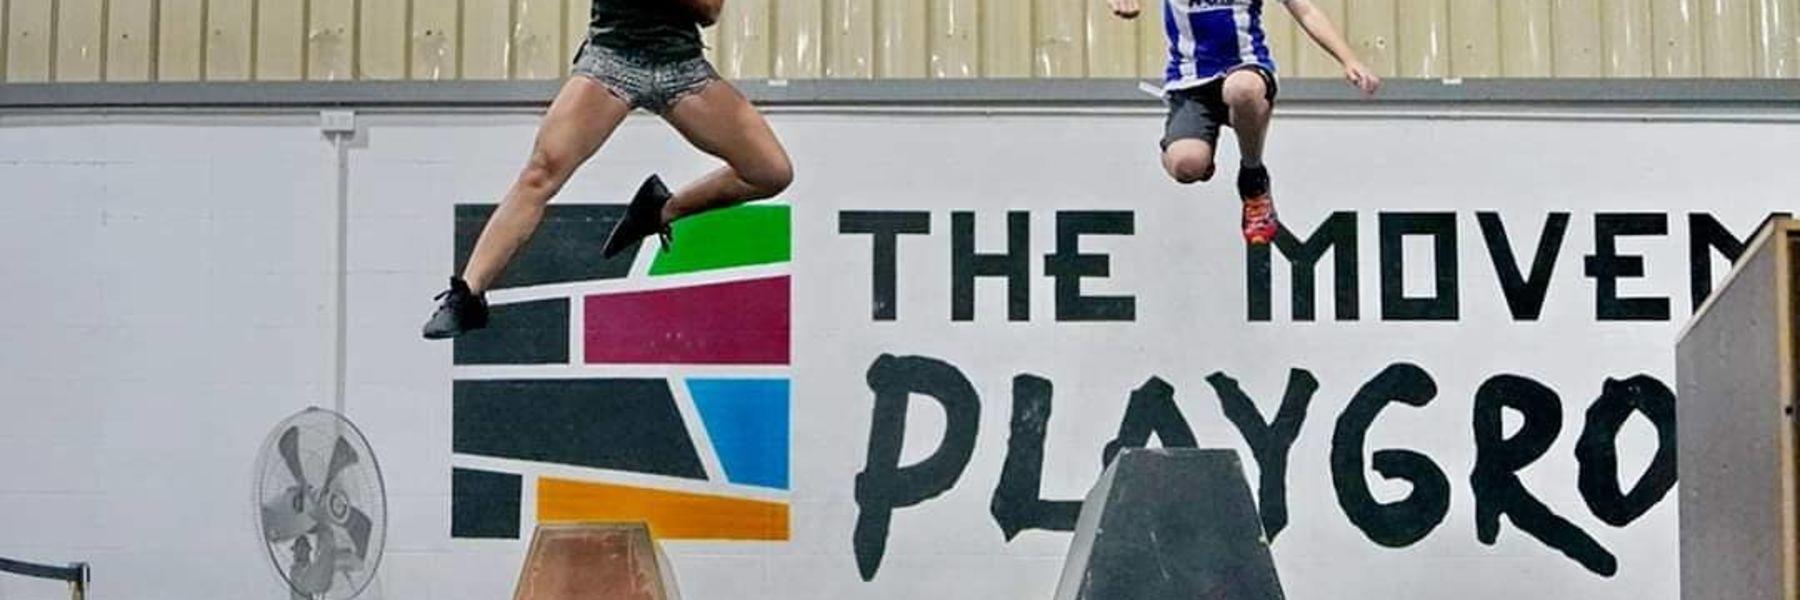 The Movement Playground - Mega Park image